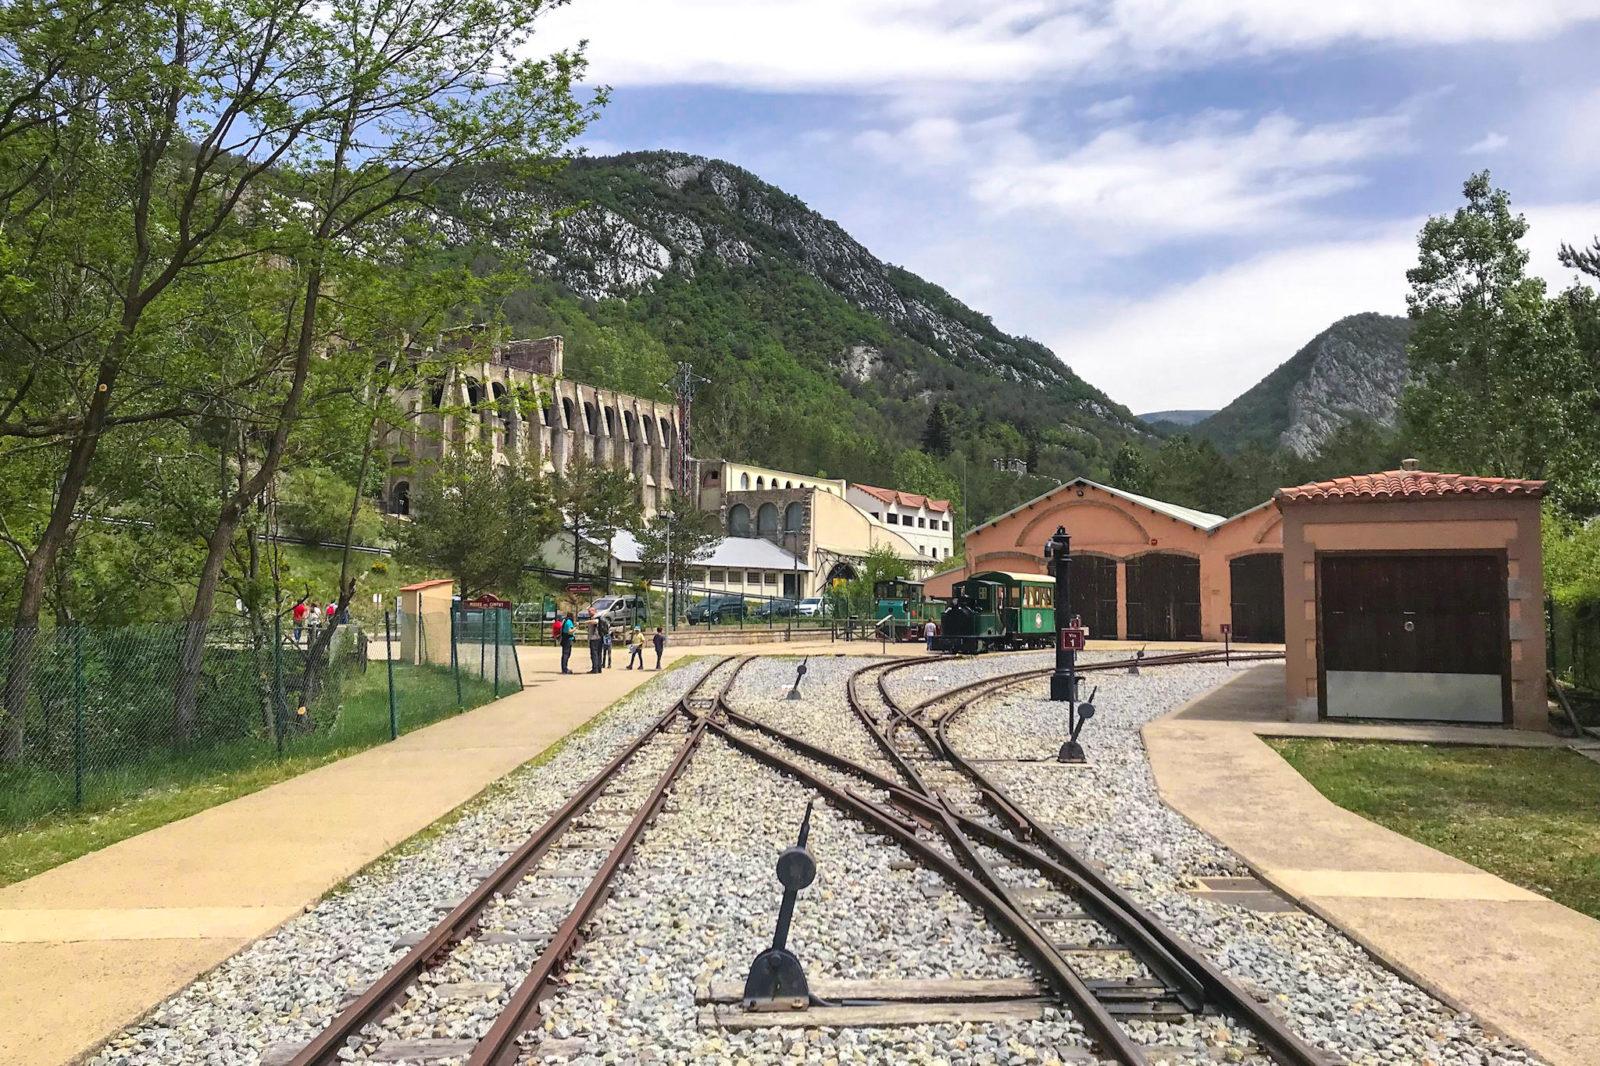 Станция Цементого завода (фото: Xavier Farrando Sopeña)